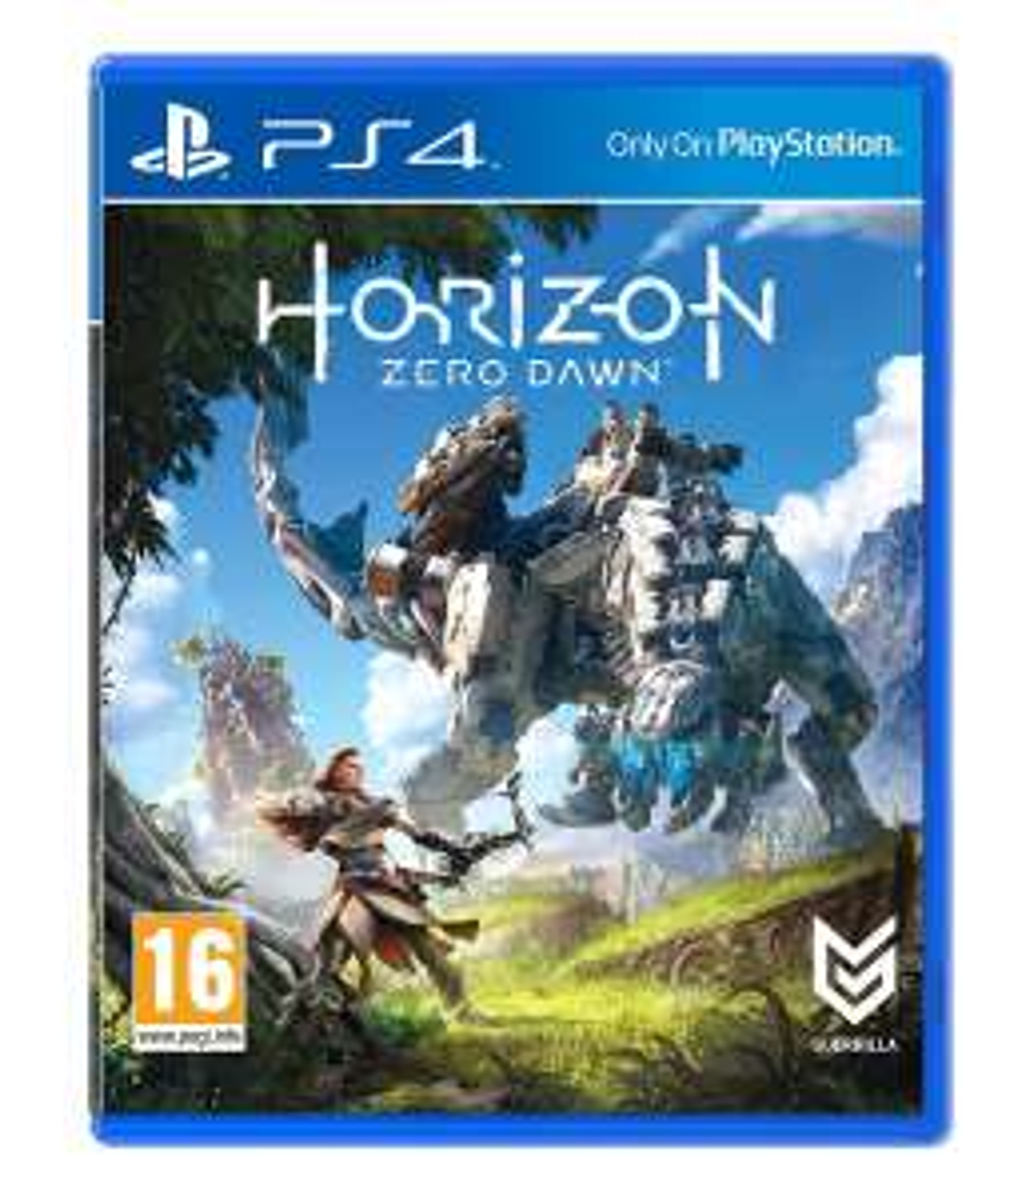 [PS4] Horizon: Zero Dawn - £34.99 - Go2Games